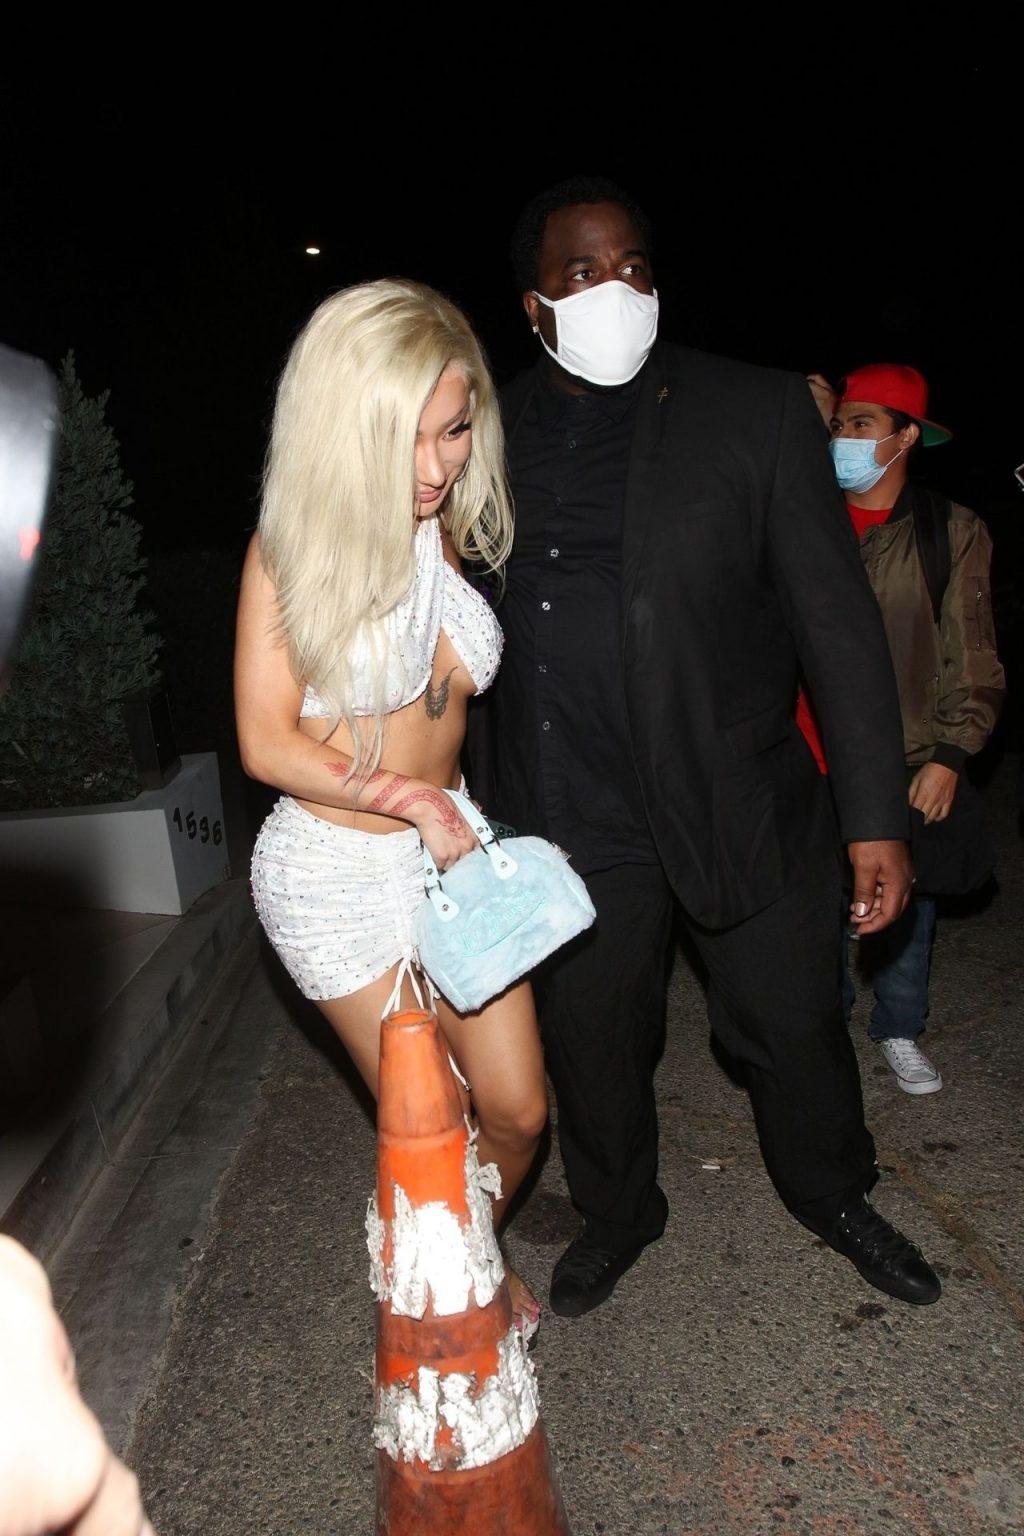 Nikita Dragun Shows Off Her Figure as She Exits a Party (26 Photos)